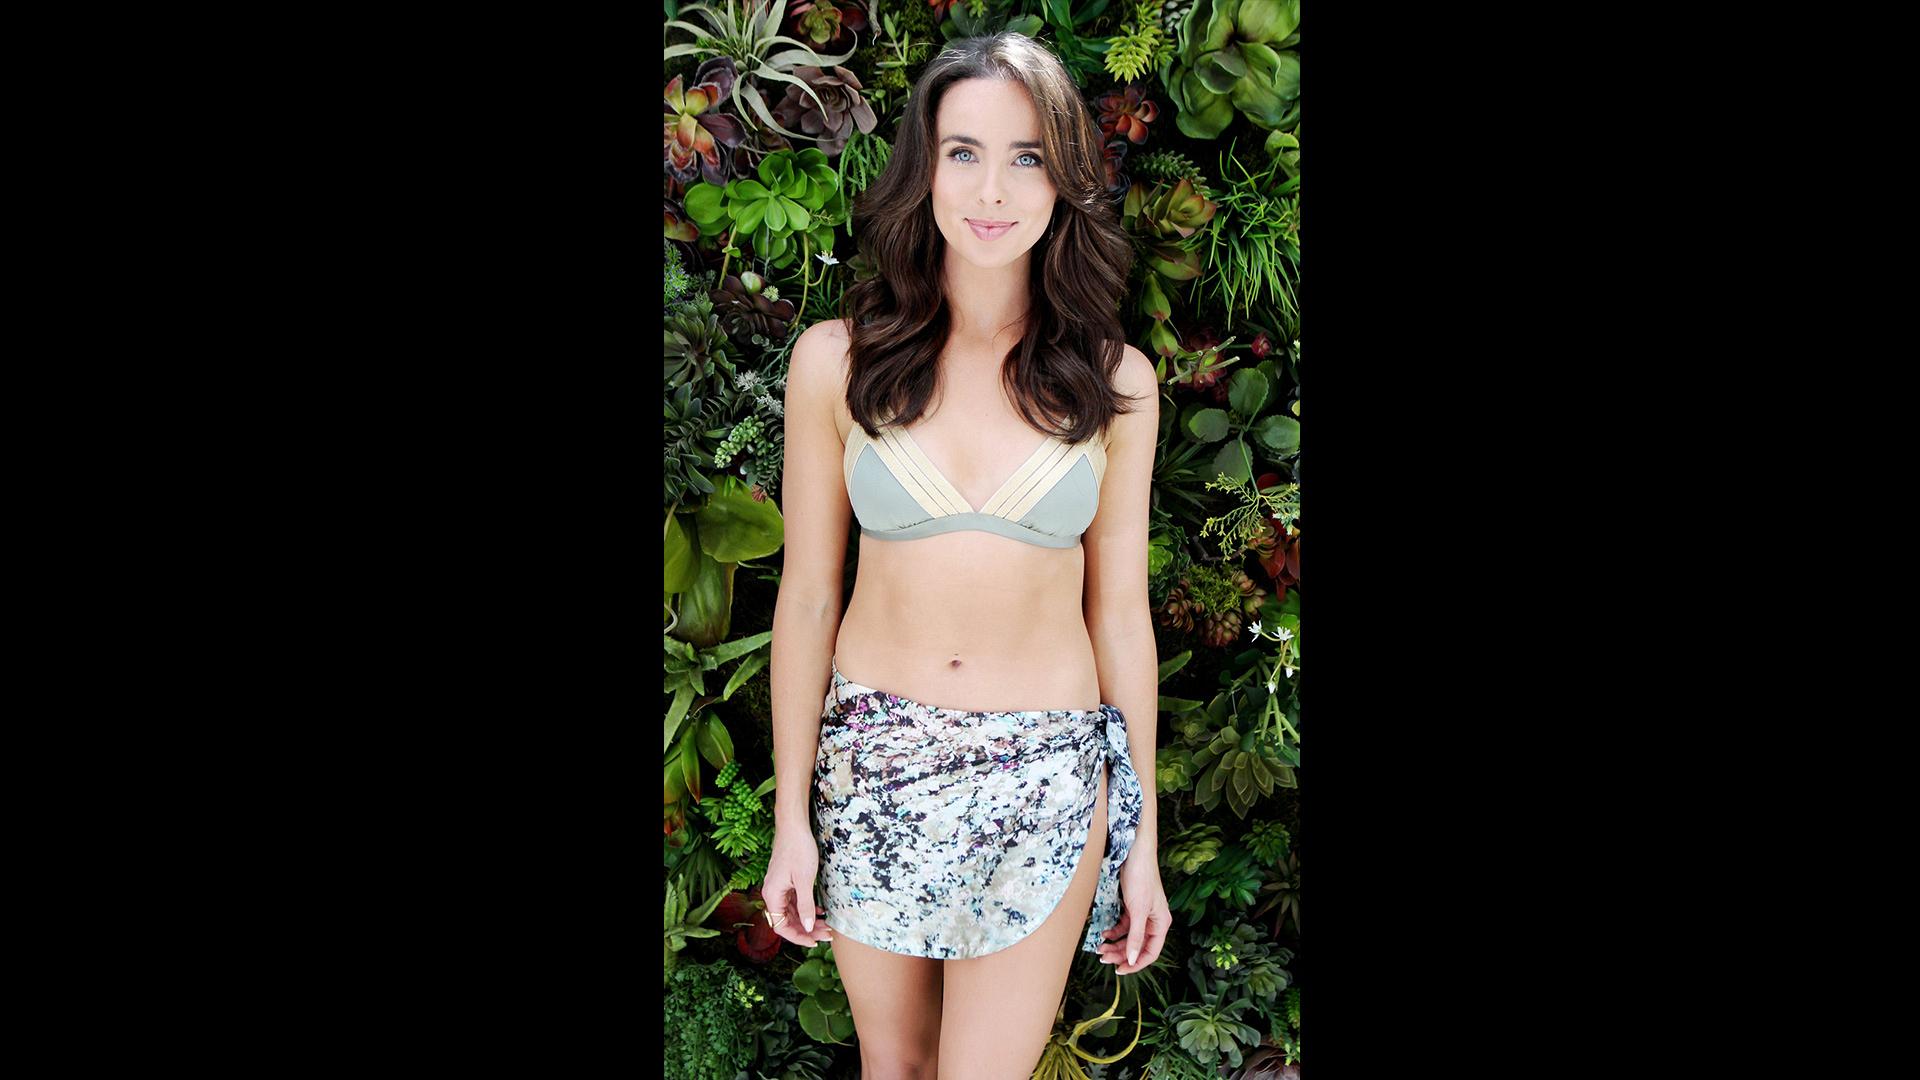 Ashleigh Brewer makes a sarong look so right.